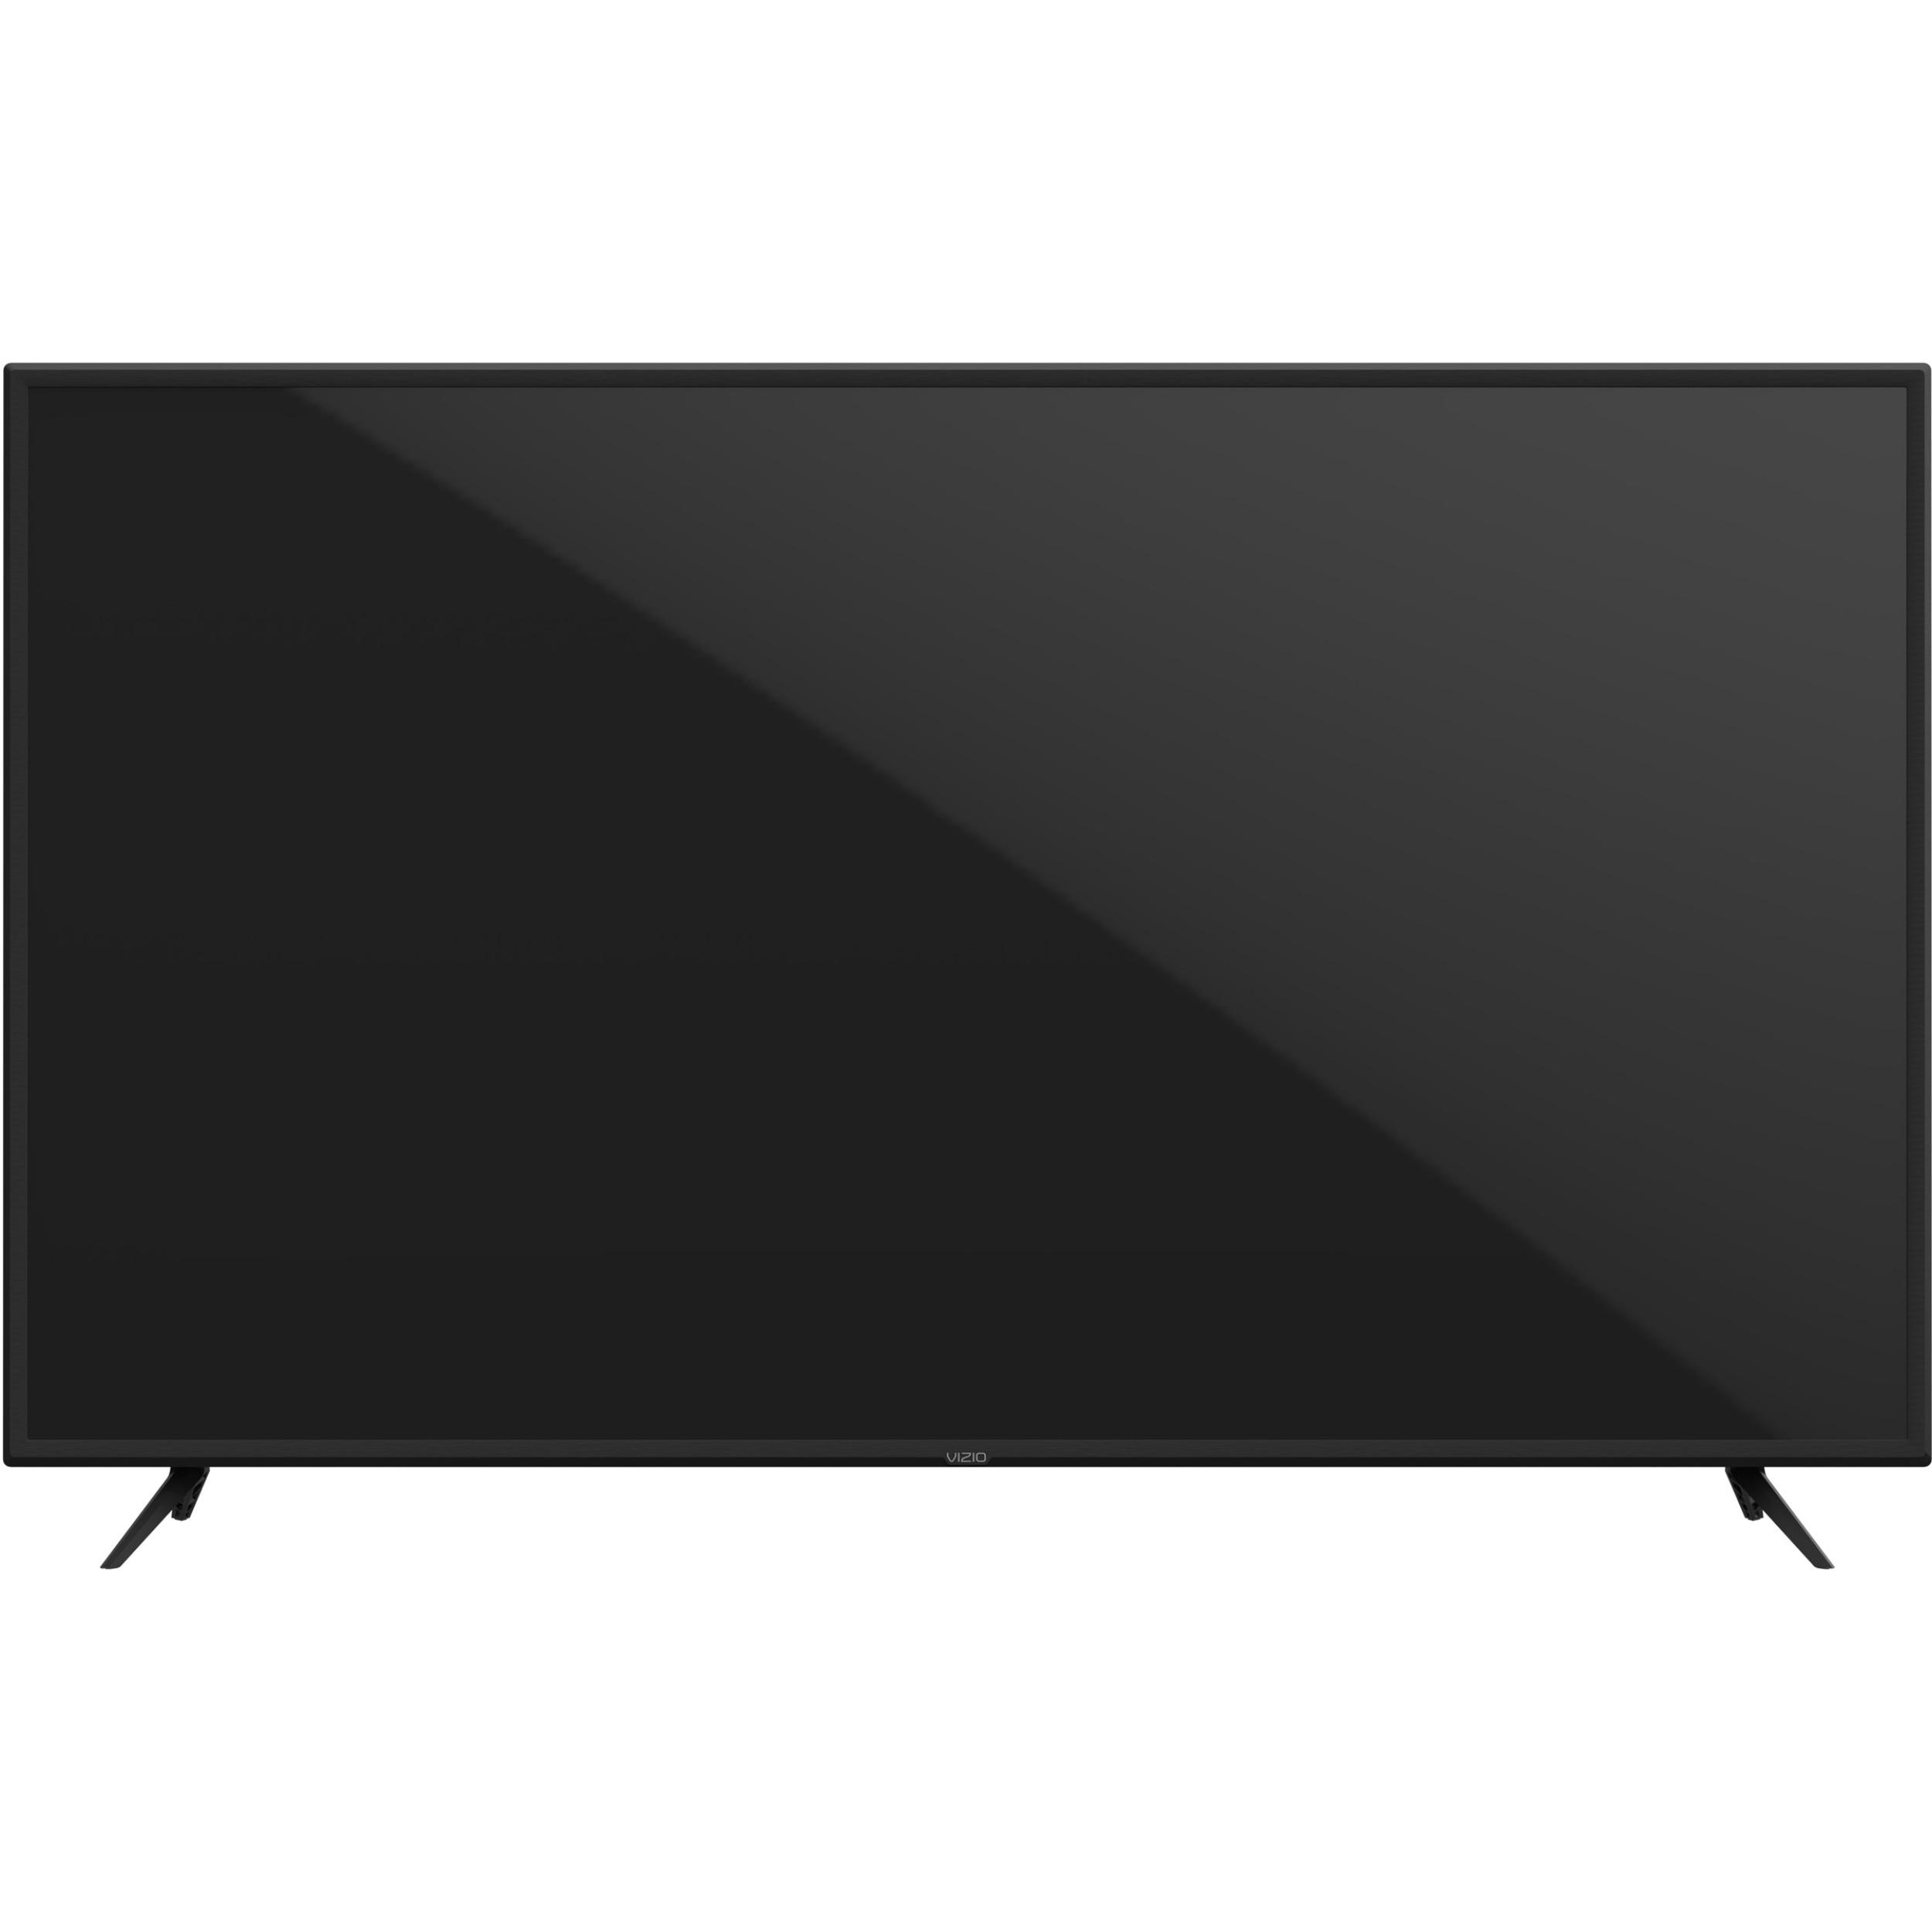 VIZIO D D60-F3 60-inch 4K Ultra HD LED Smart TV - 3840 x 2160 - (Refurbished)